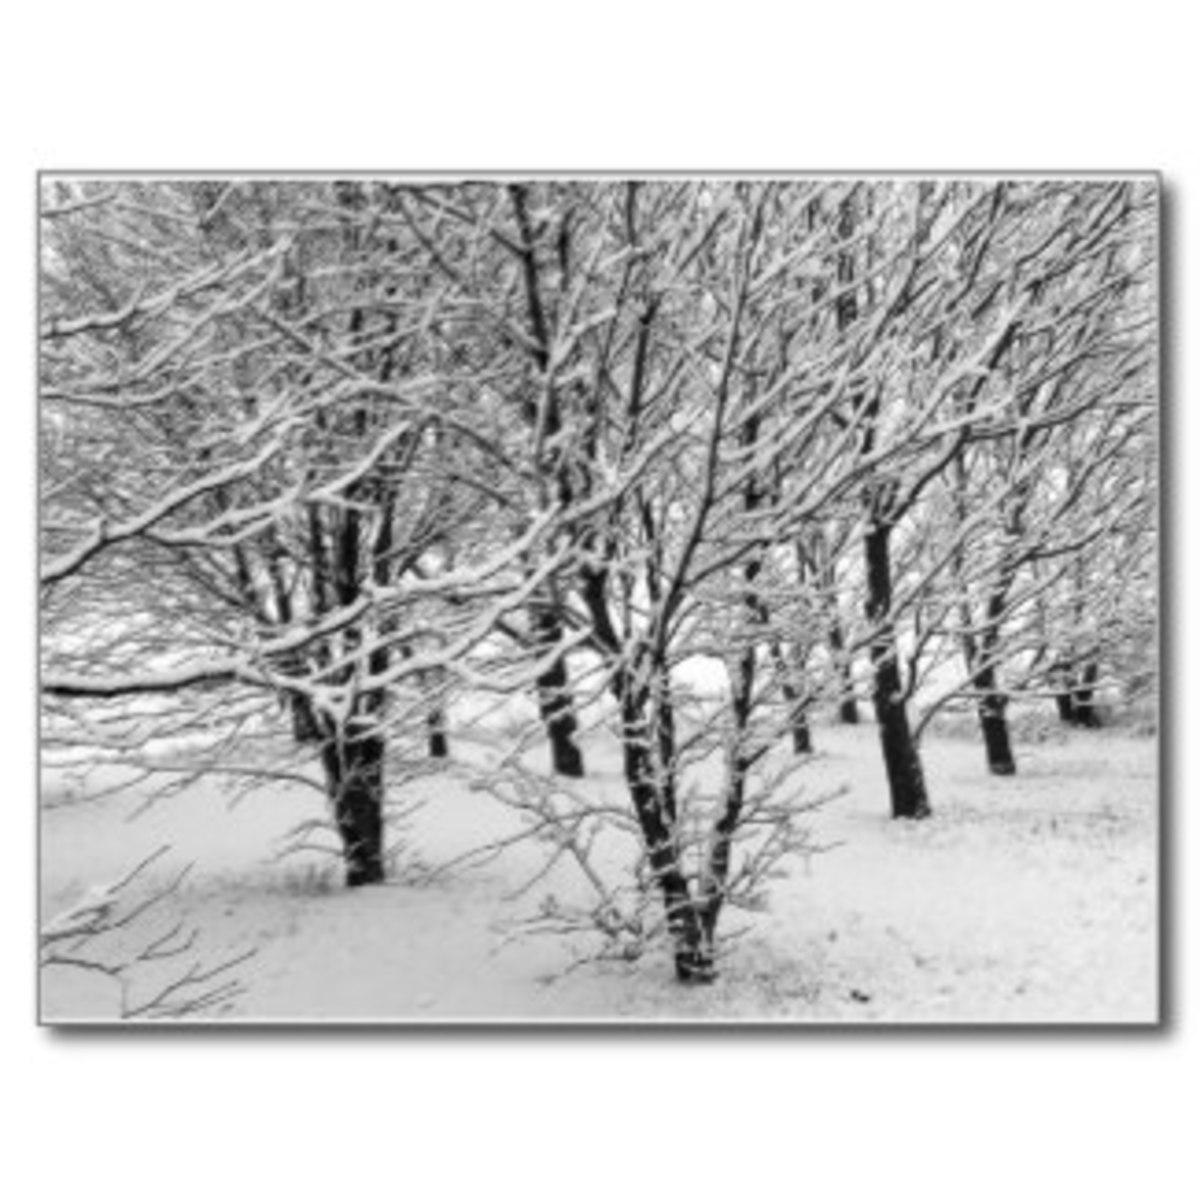 winter snows by ilonagarden